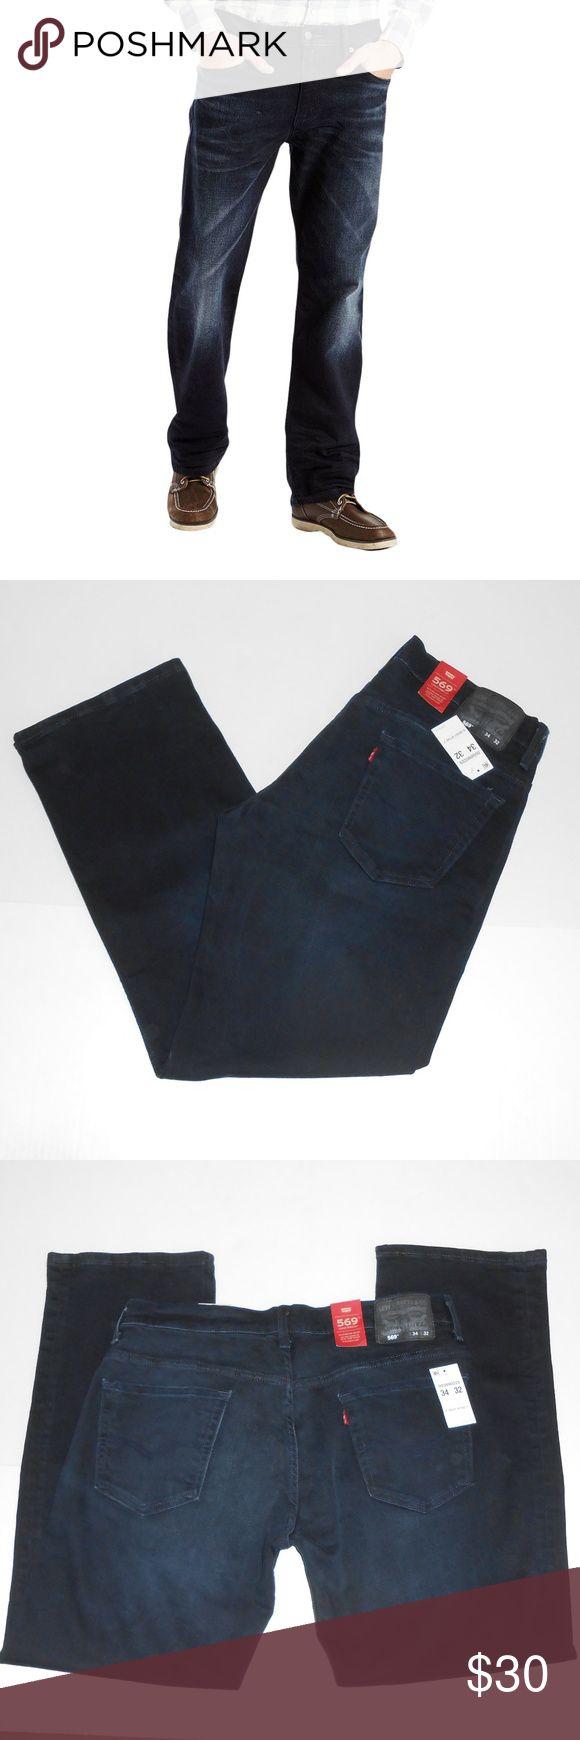 "Levis  569 Loose Straight Leg Jeans sz 34x32 Brand new pair of Levis 569 Loose Straight Leg Jeans sz 34x32. Cotton blend. Dark blue.  Measurements Waist: 18.5"" across Inseam: 31"" Levi's Jeans"